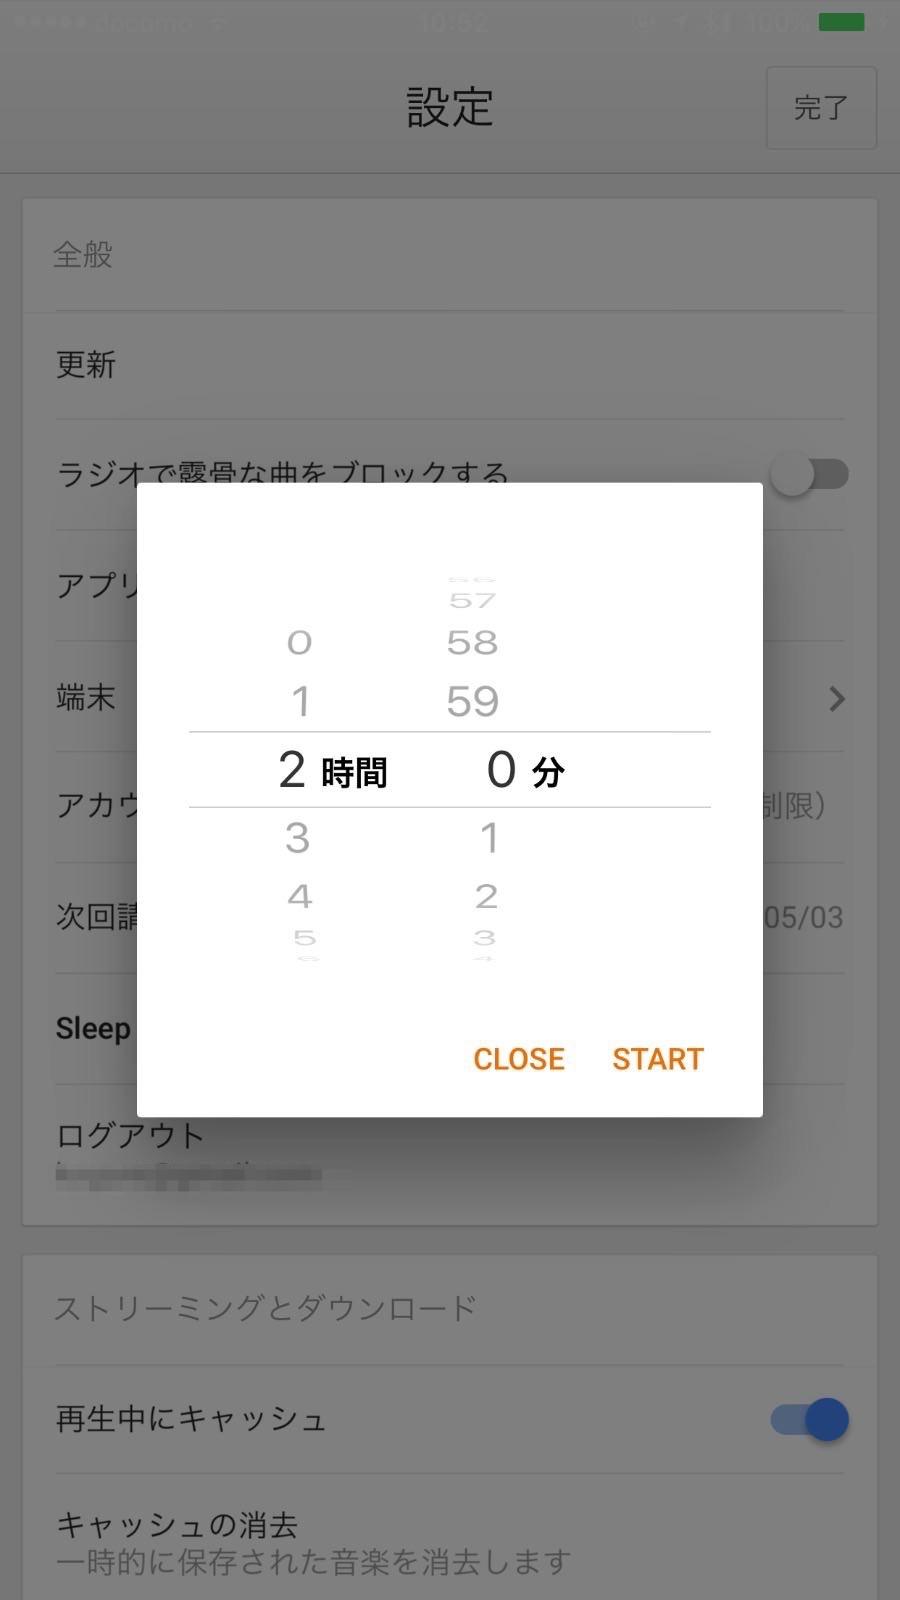 【Google Play Music】iOSアプリでスリープタイマーを利用する方法